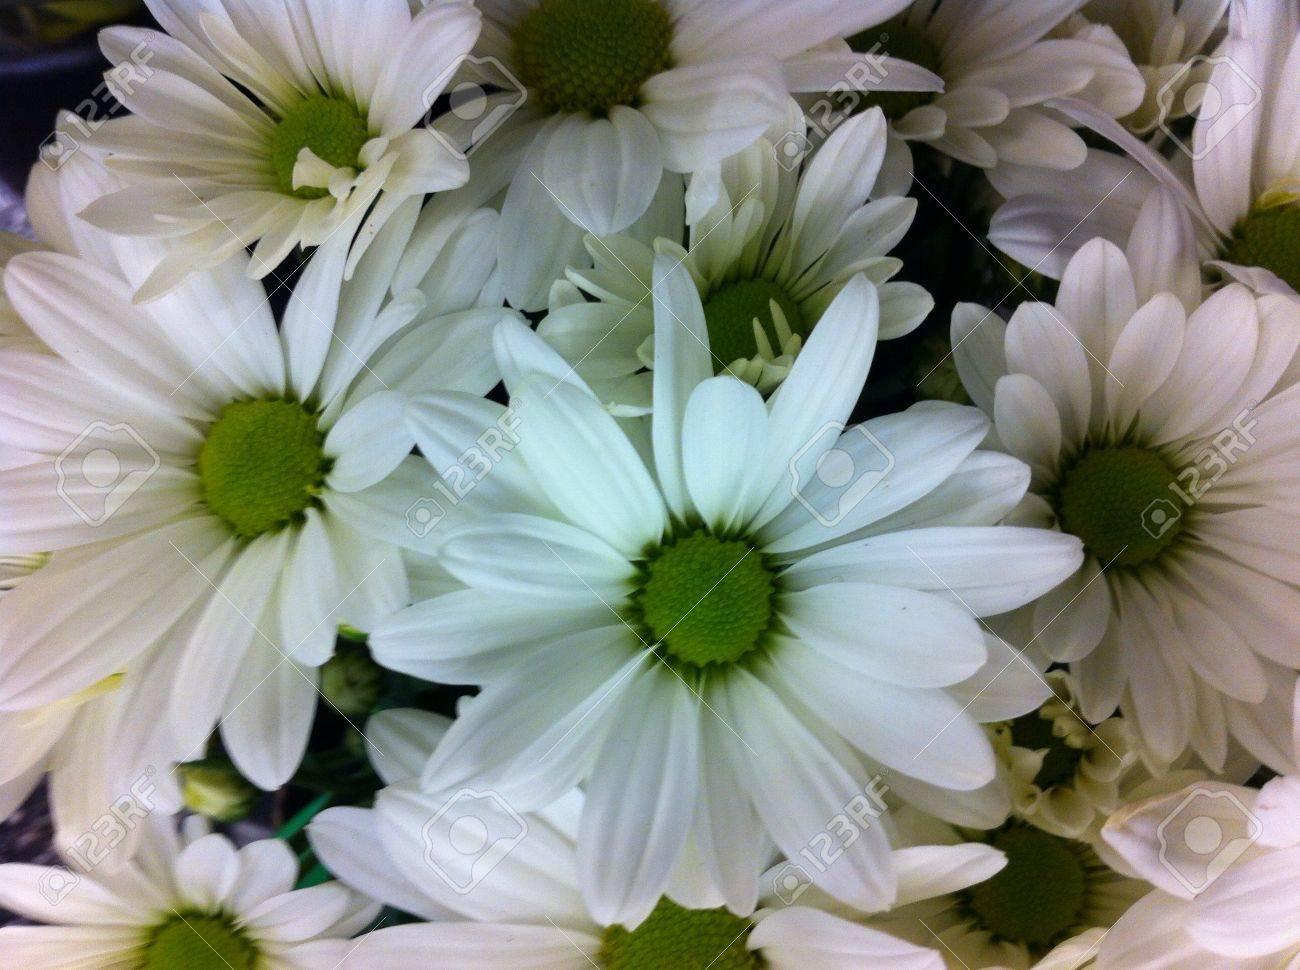 White Flowers Mum Crisantemos Flores Blancas Stock Photo Picture